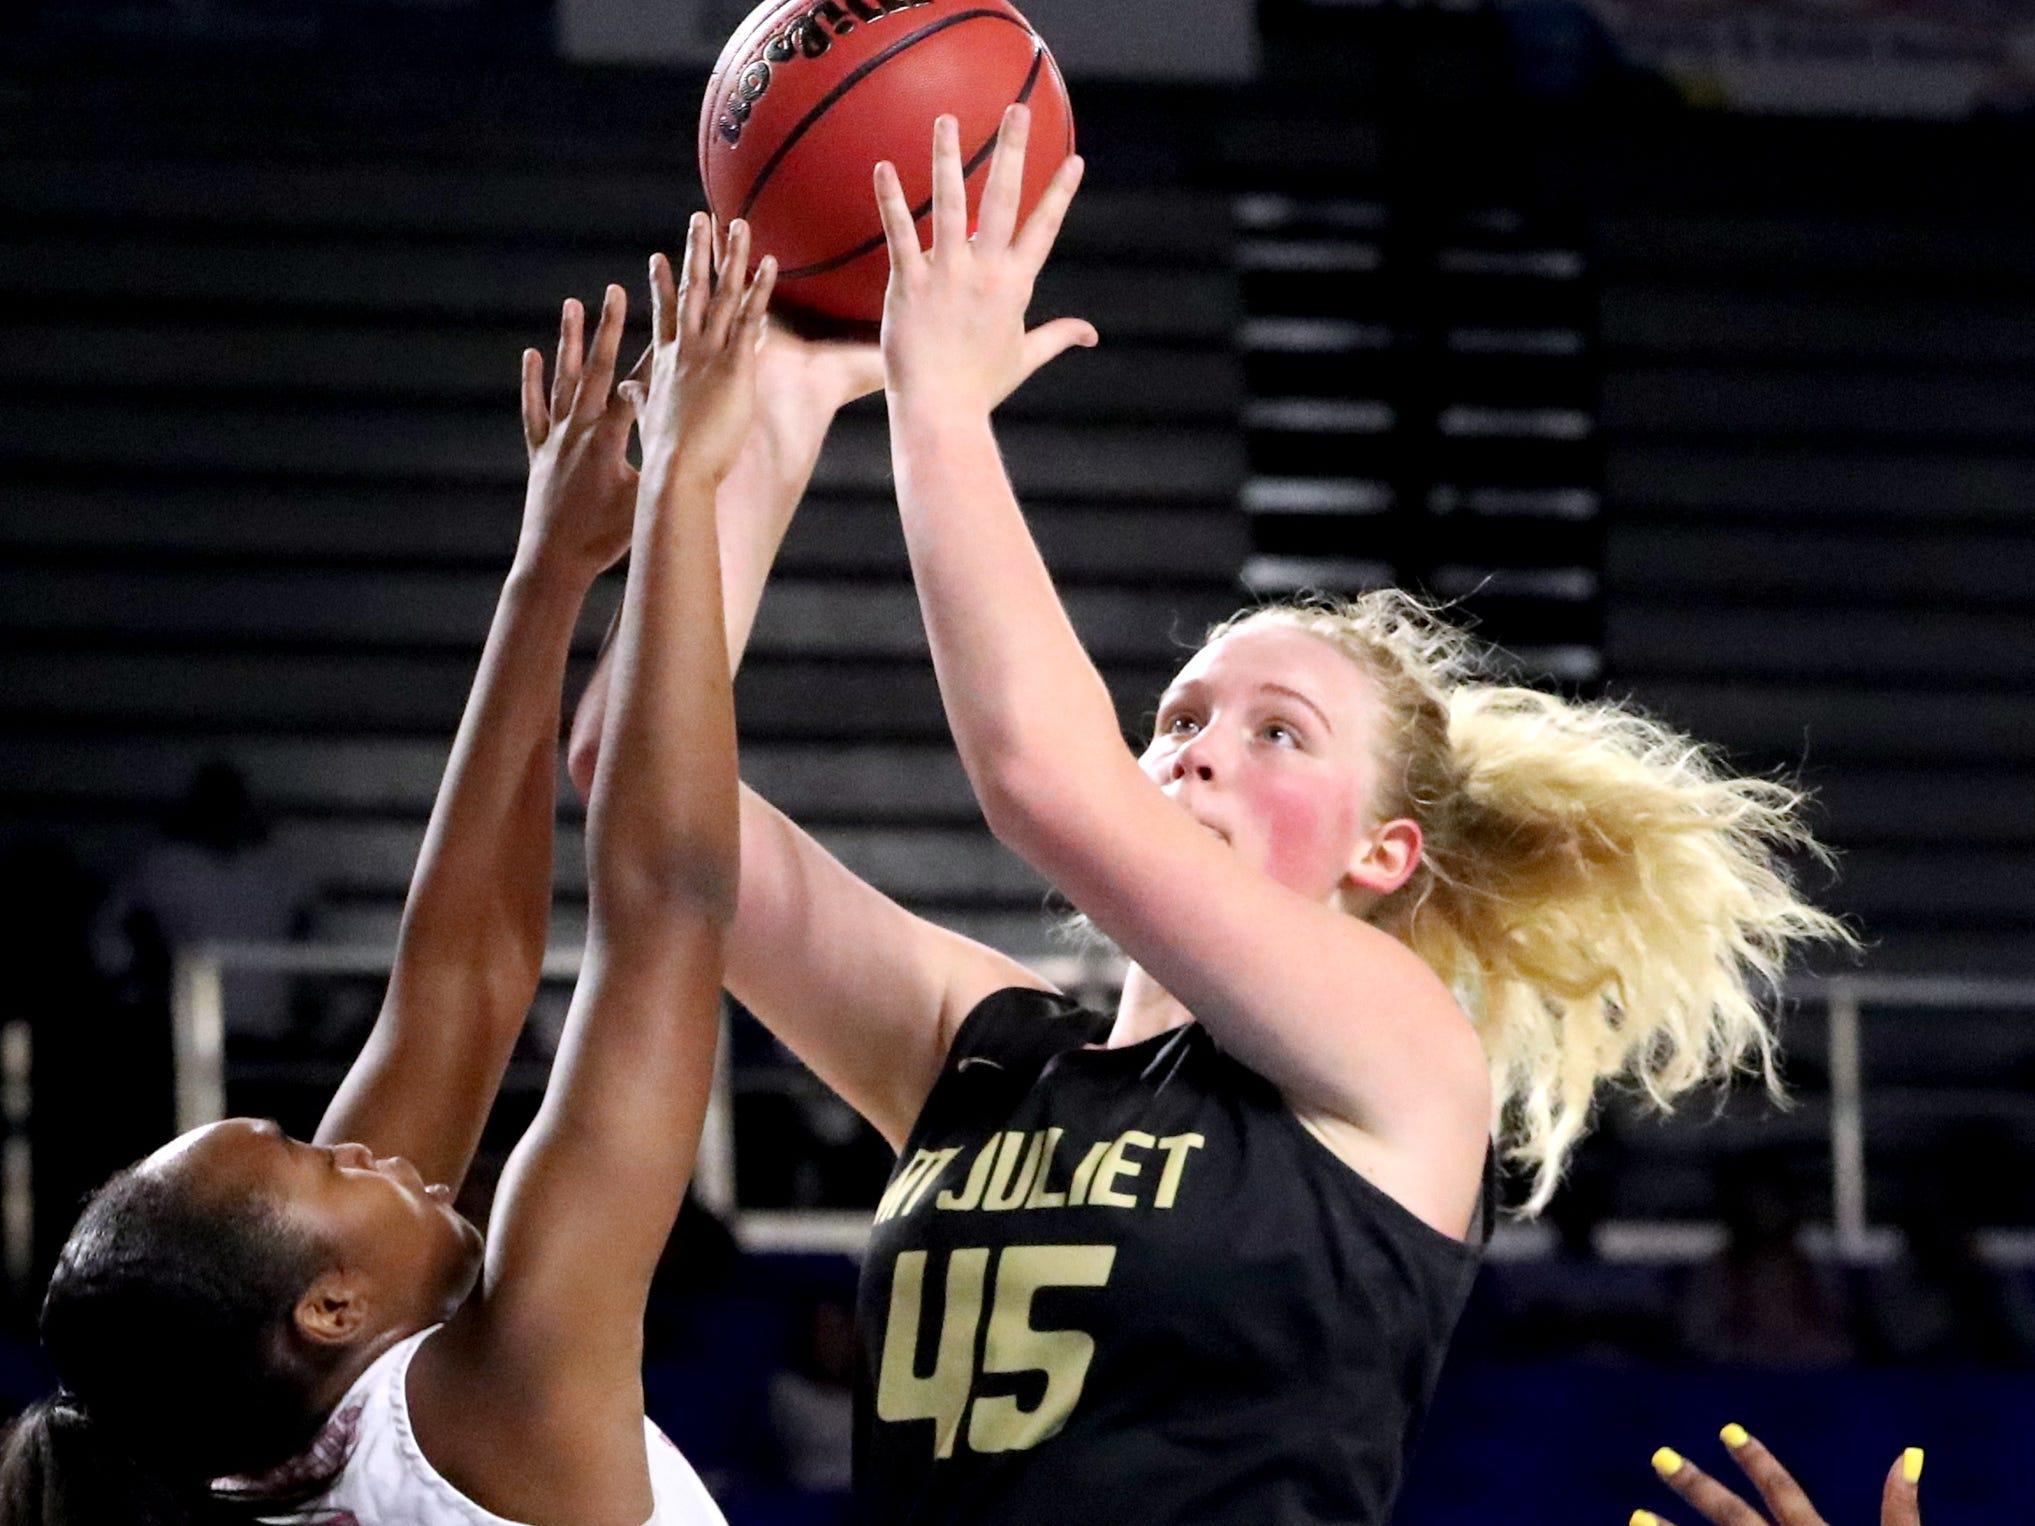 Mt. Juliet's Nevaeh Majors (24) shoots the ball ass Houston's Destinee Wells (24) guards her during the quarterfinal round of the TSSAA Div. 1 Class AAA Girls State Tournament, on Wednesday, March 6, 2019, at Murphy Center in Murfreesboro, Tenn.